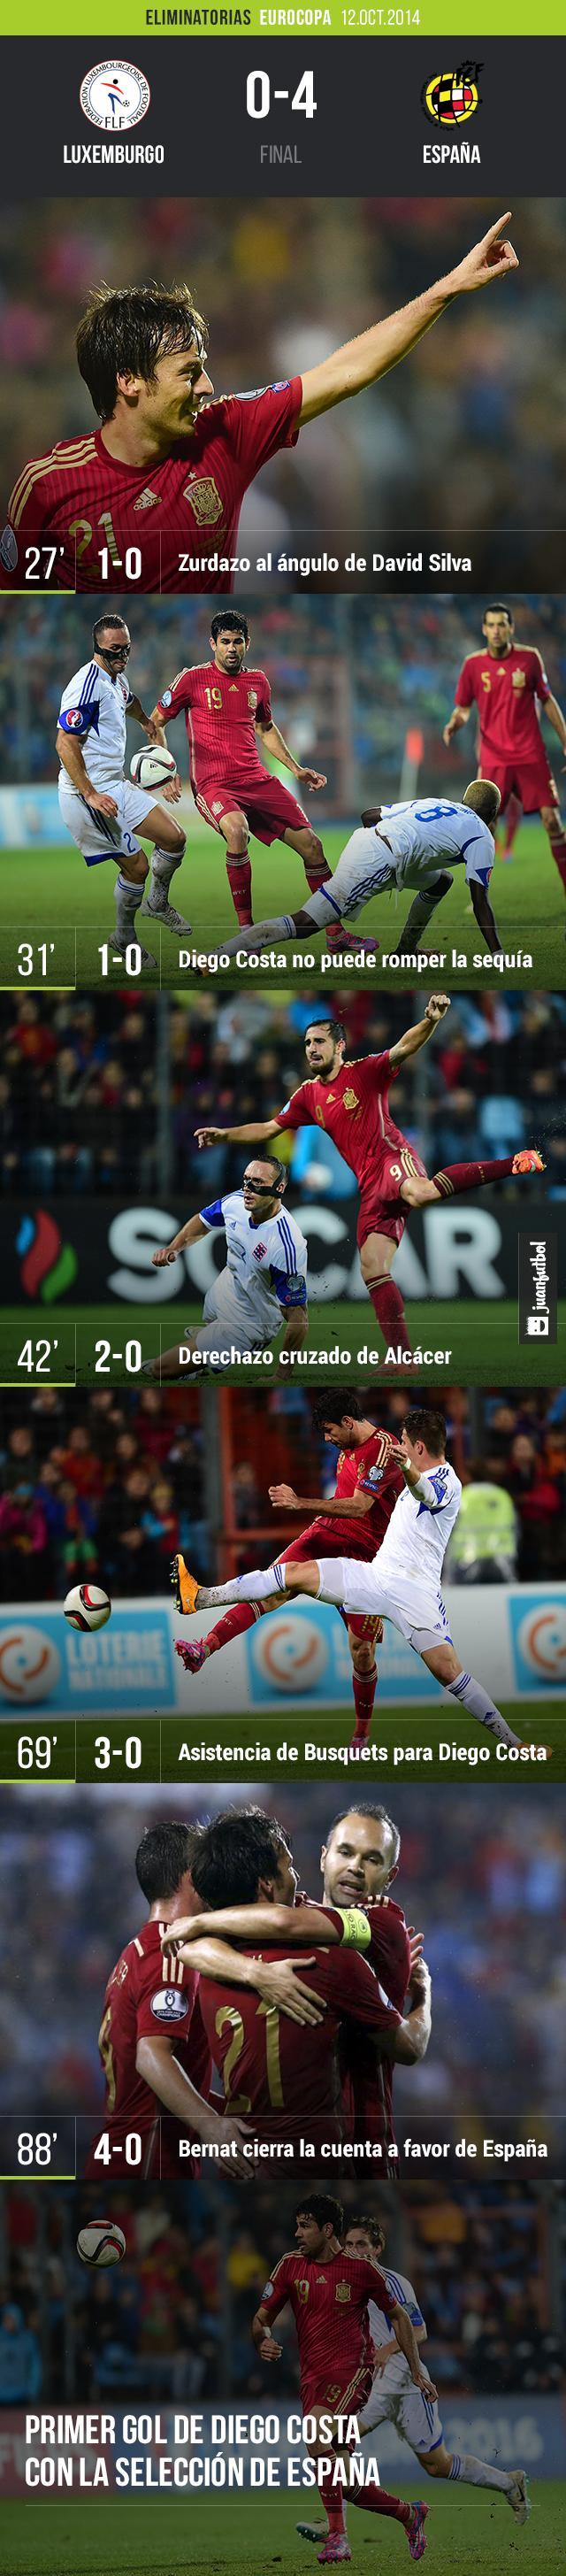 España derrota a Luxemburgo en las eliminatorias de la Eurocopa